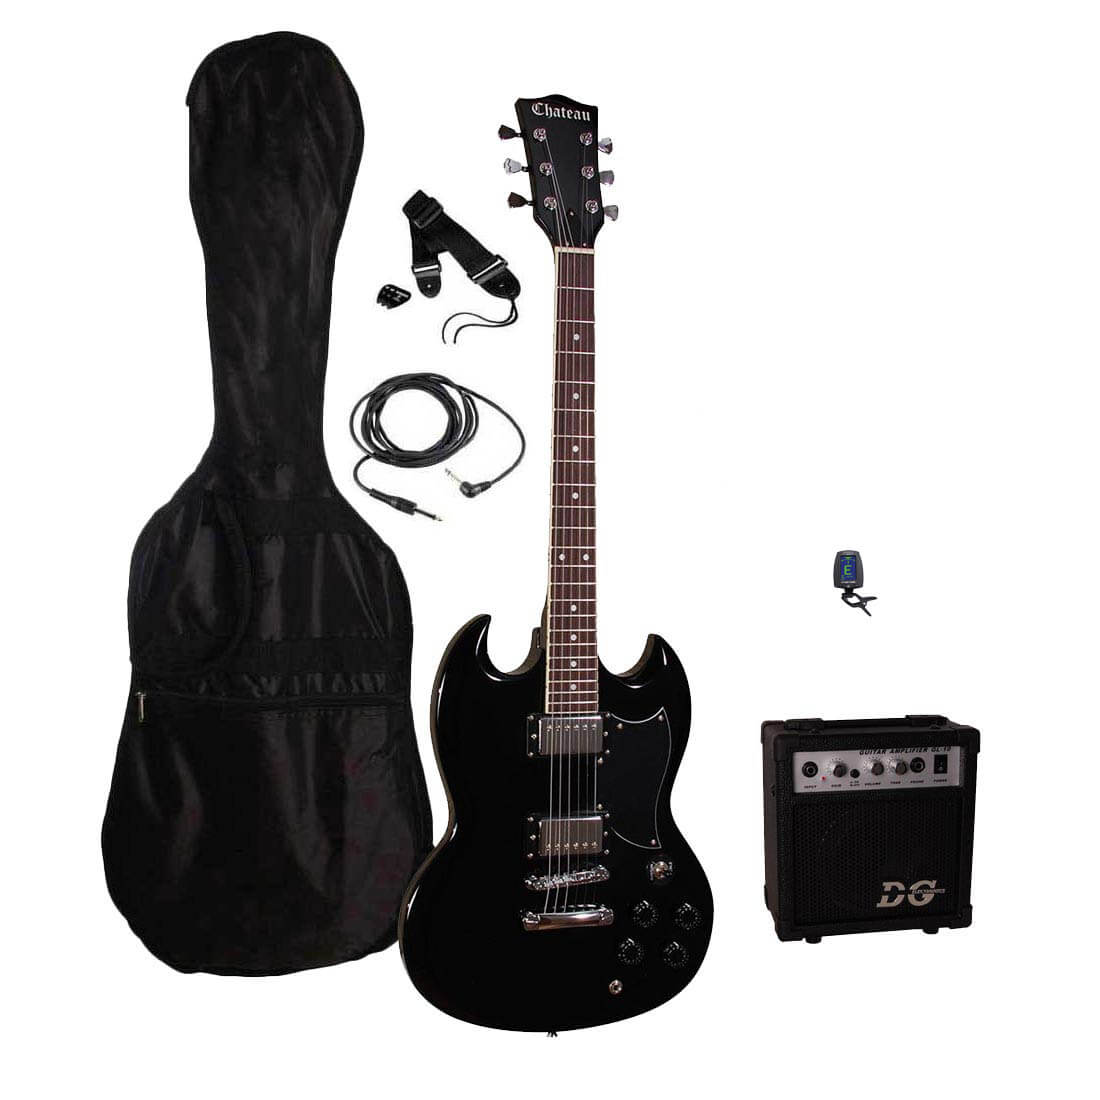 Chateau DC30-BK el-guitar sort, pakke 1